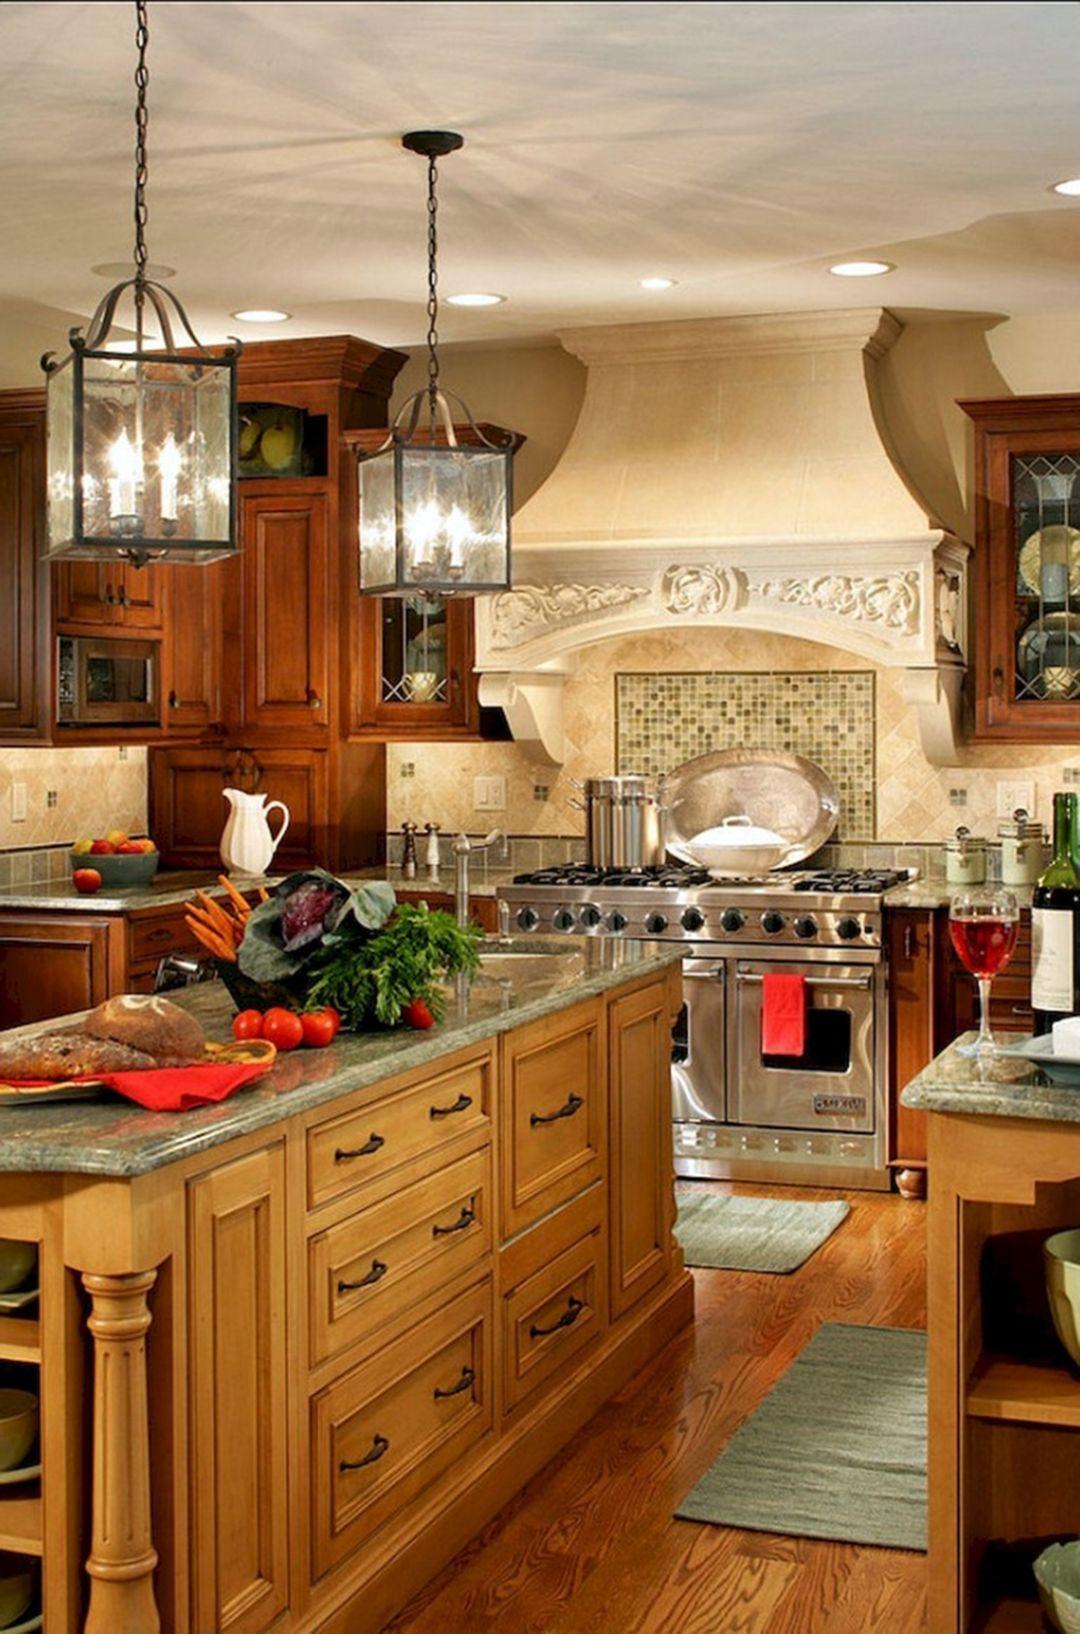 11 elegant modern rustic farmhouse kitchen ideas